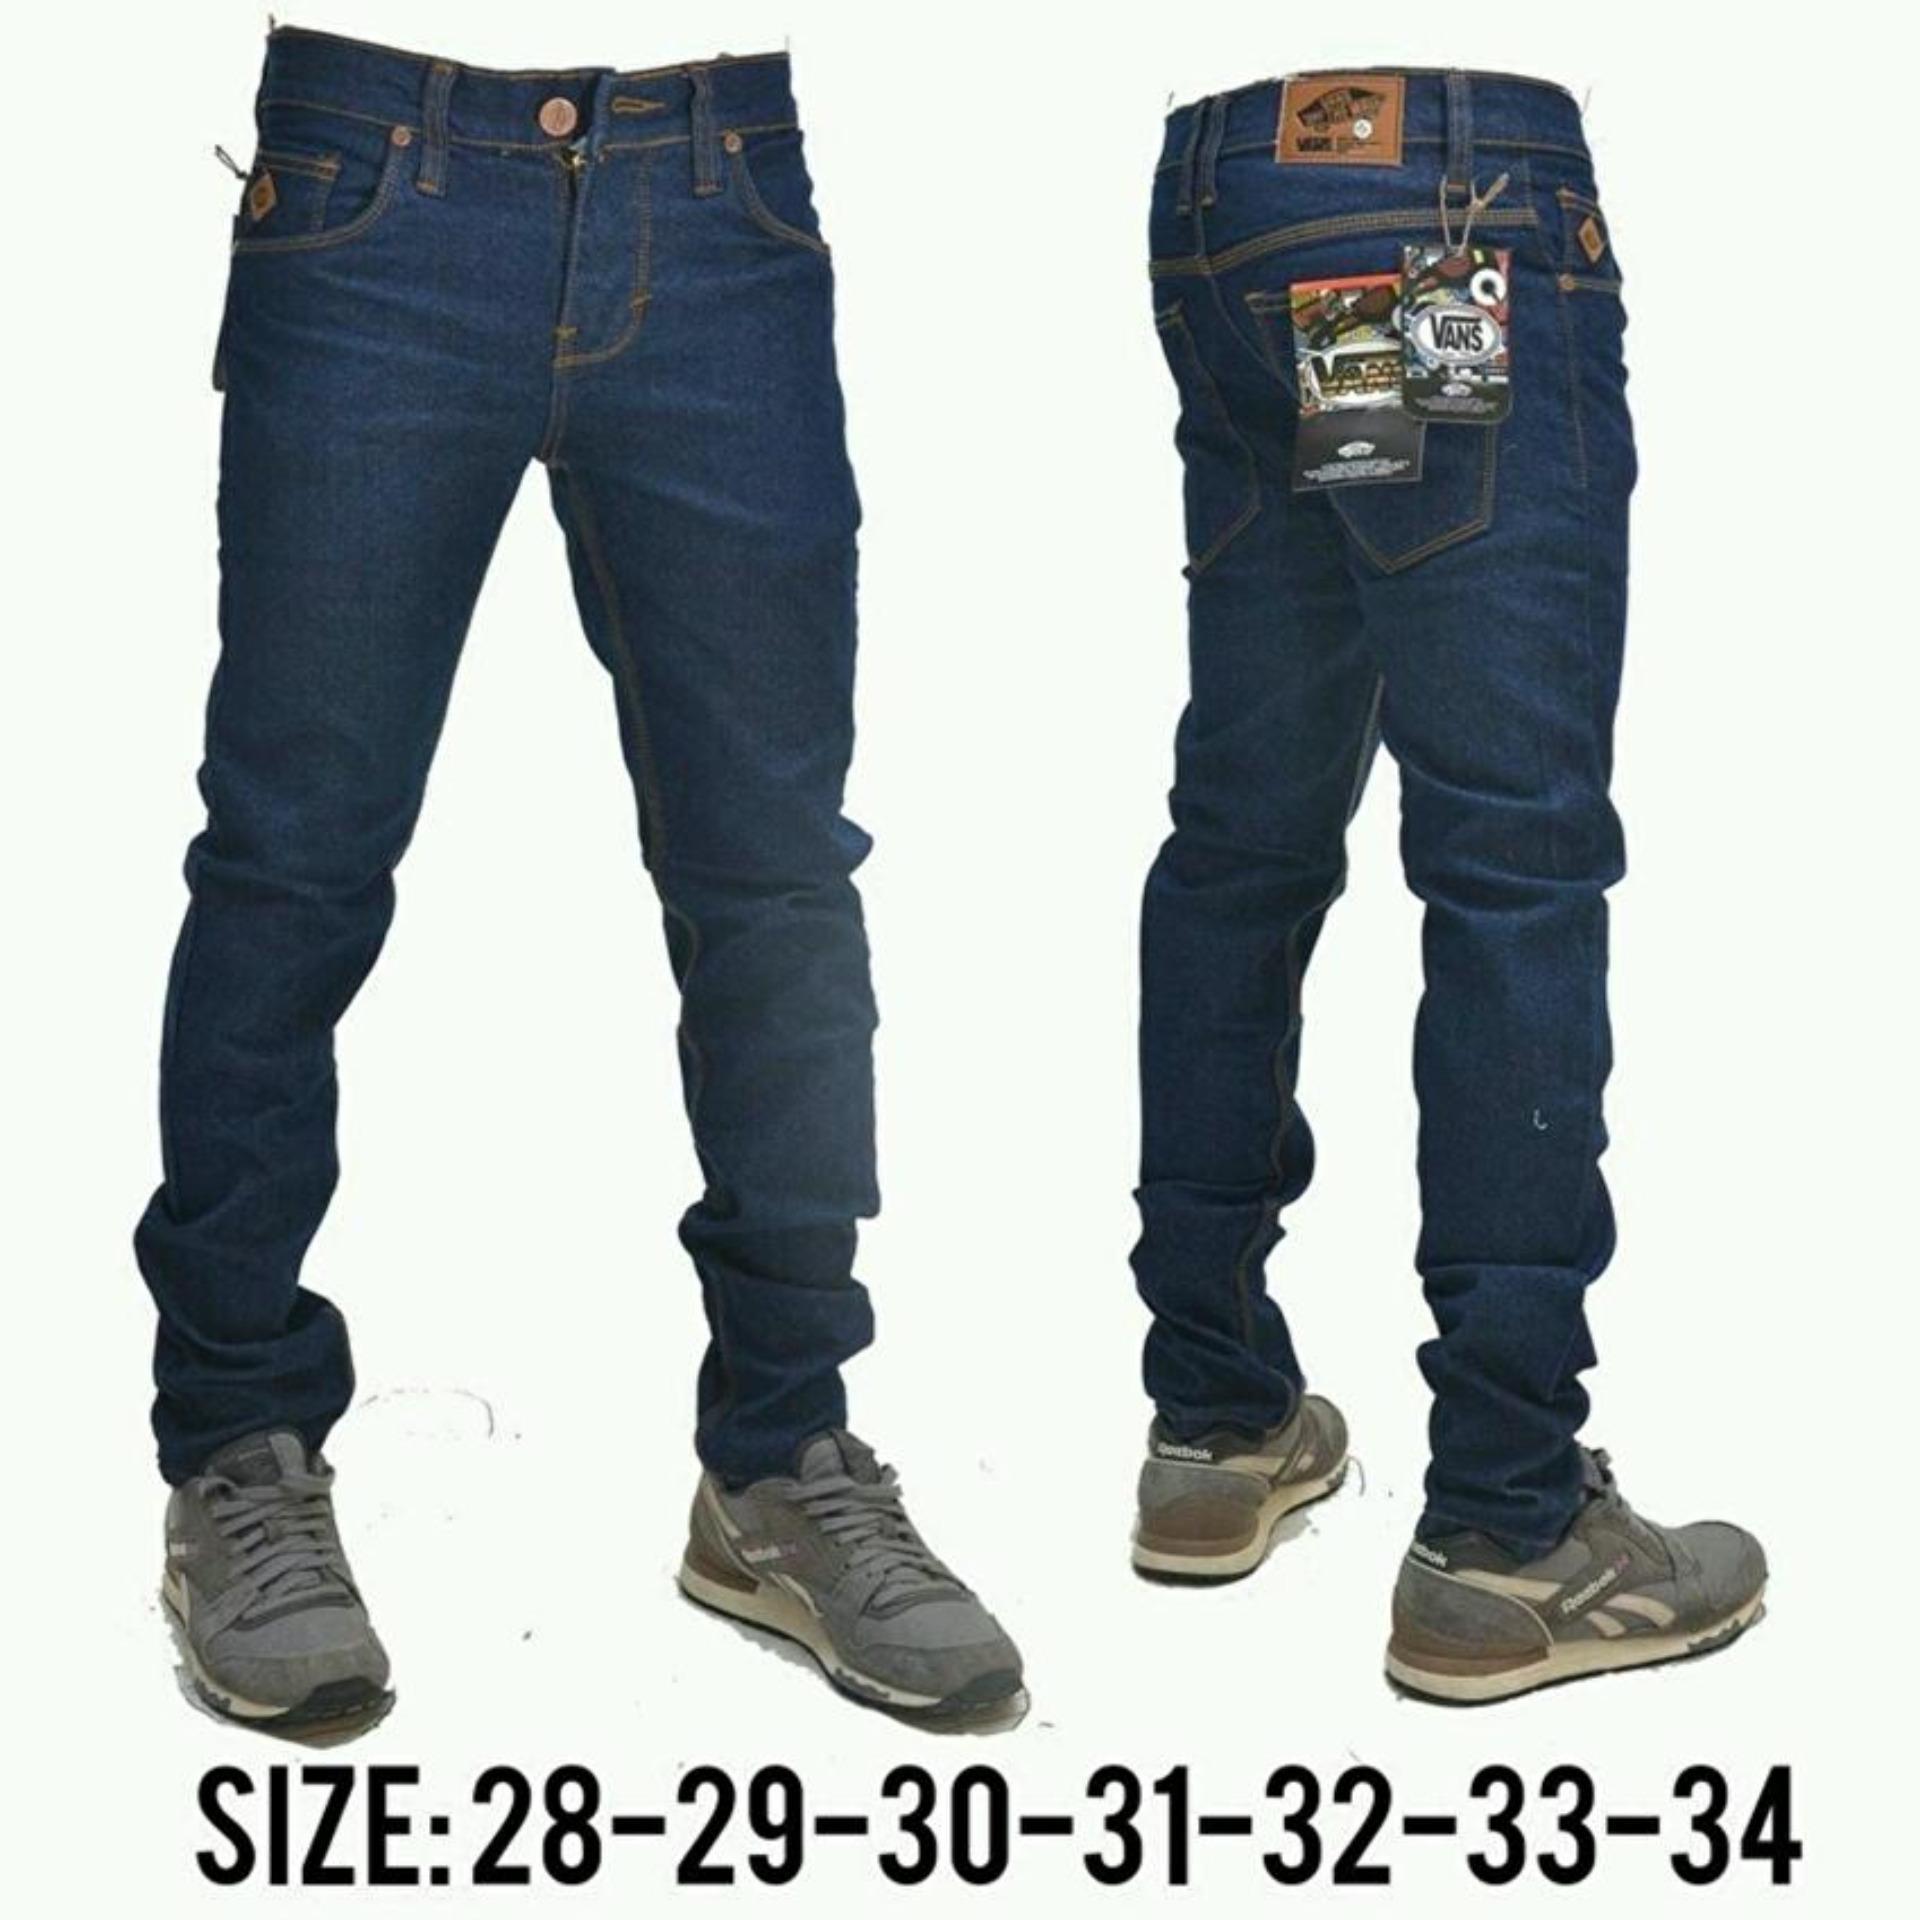 Promo Fg Celana Jeans Panjang Pria High Quality Skinny Dark Blue Di Jawa Barat